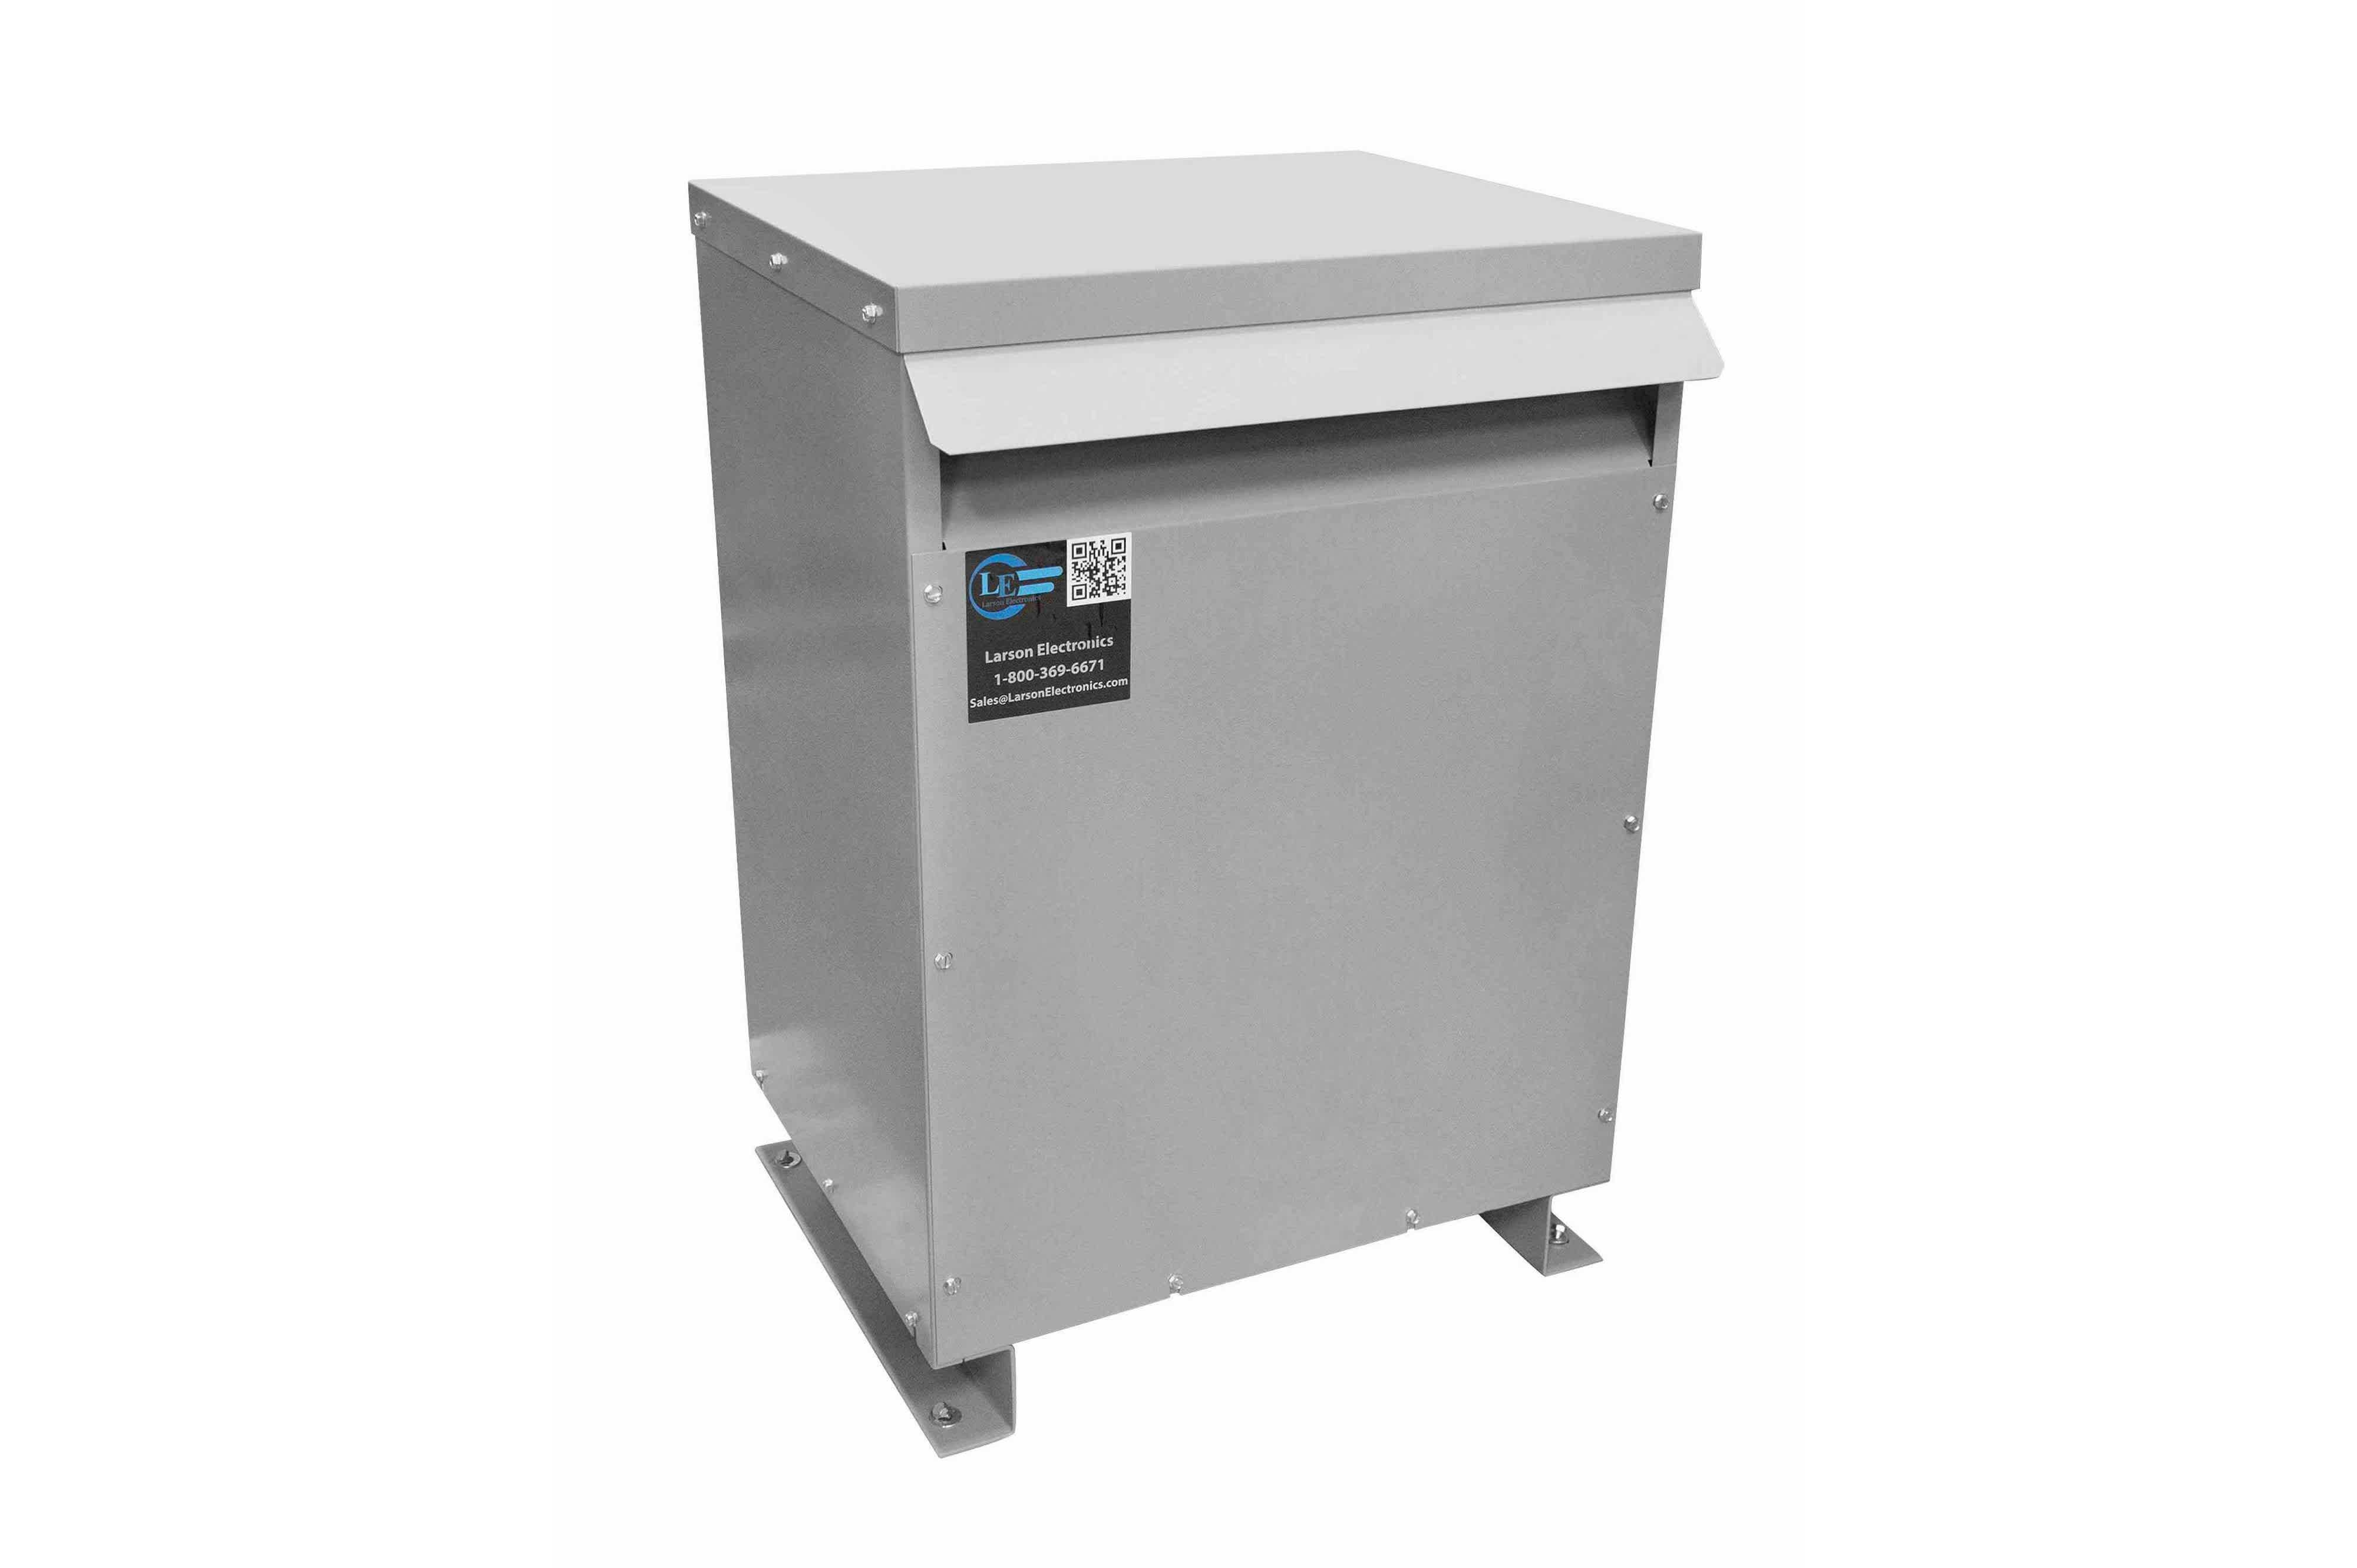 50 kVA 3PH Isolation Transformer, 380V Wye Primary, 600V Delta Secondary, N3R, Ventilated, 60 Hz